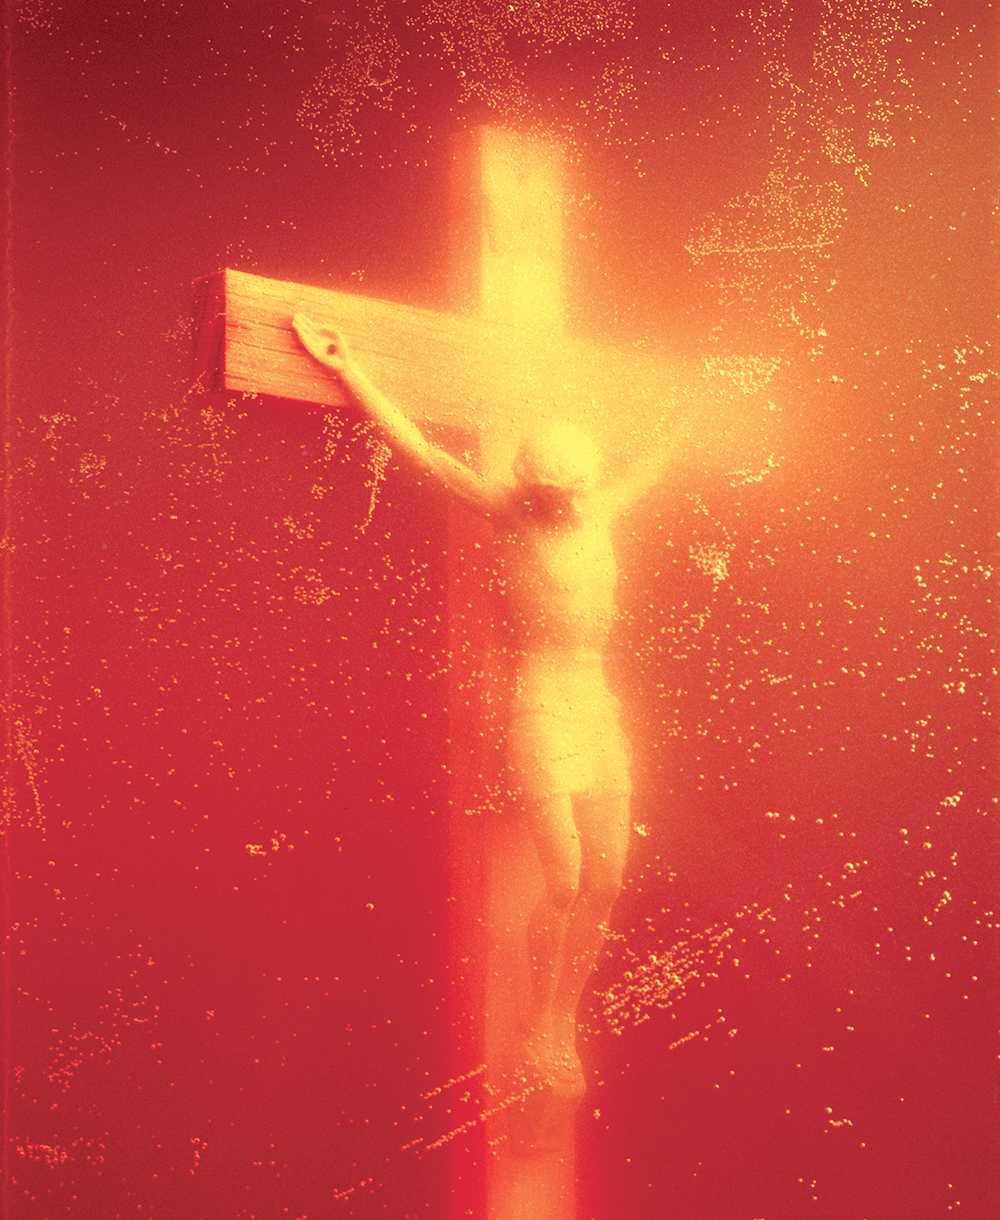 """Piss Christ"". © Courtesy Andres Serrano & Galerie Nathalie Obadia, Paris/Brussels."